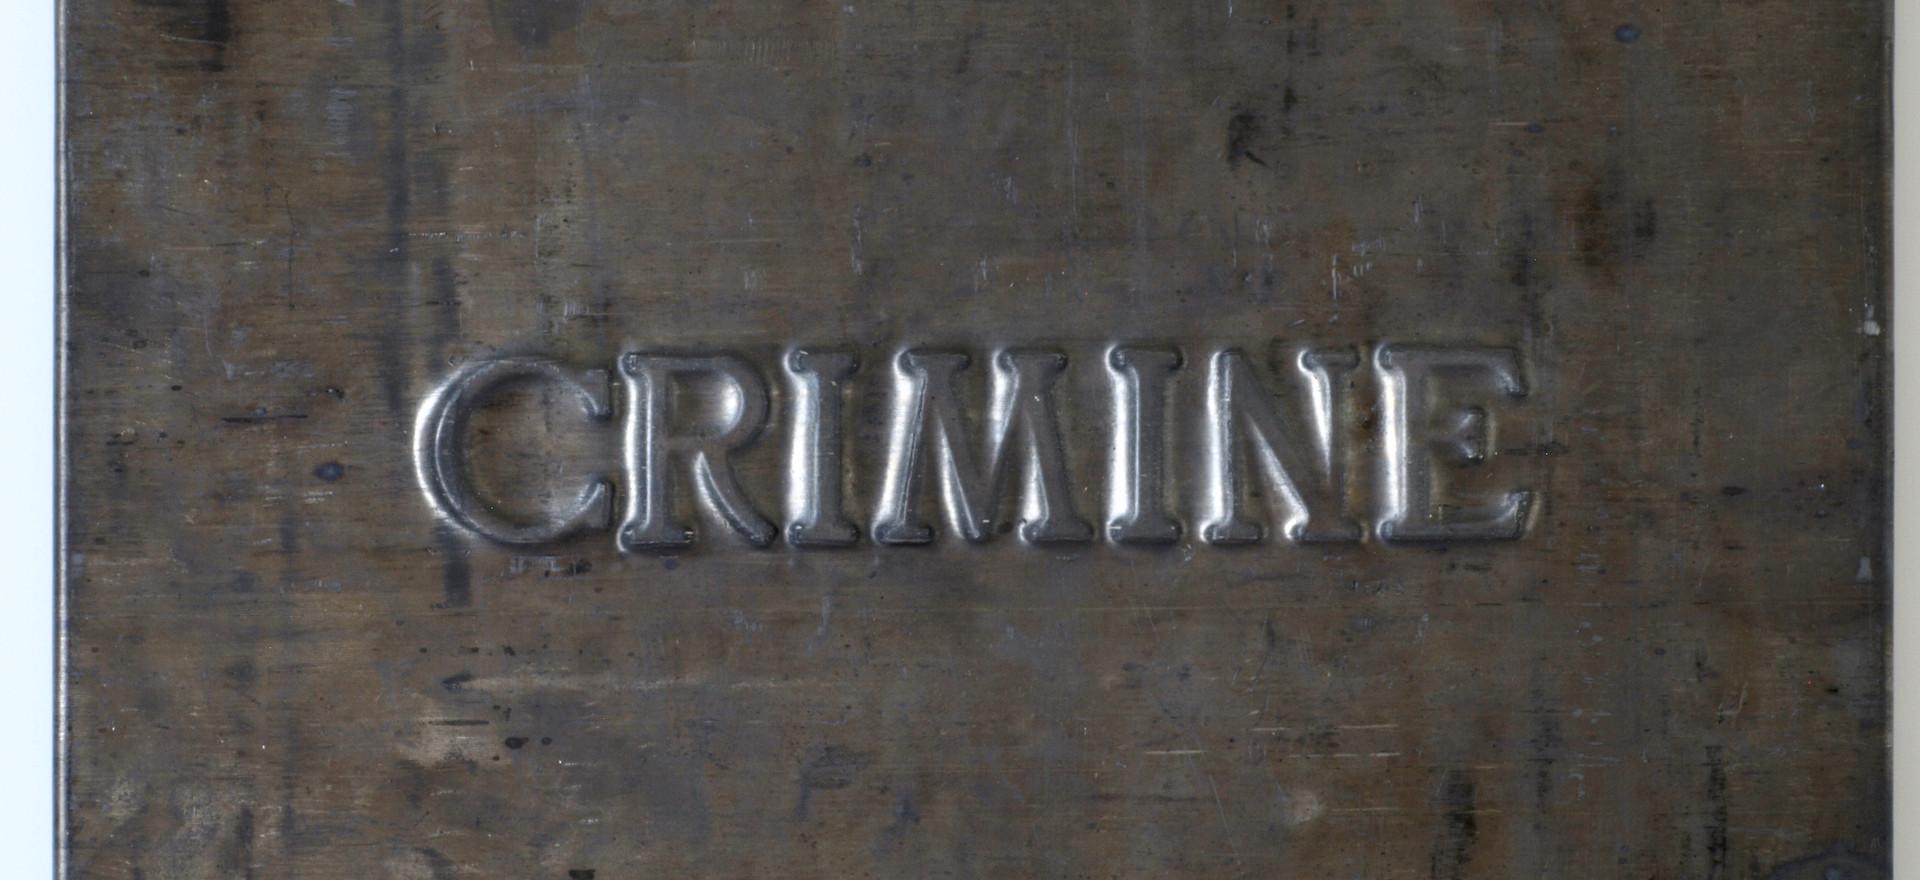 Vittorio Messina, Crimine, 2018, piombo